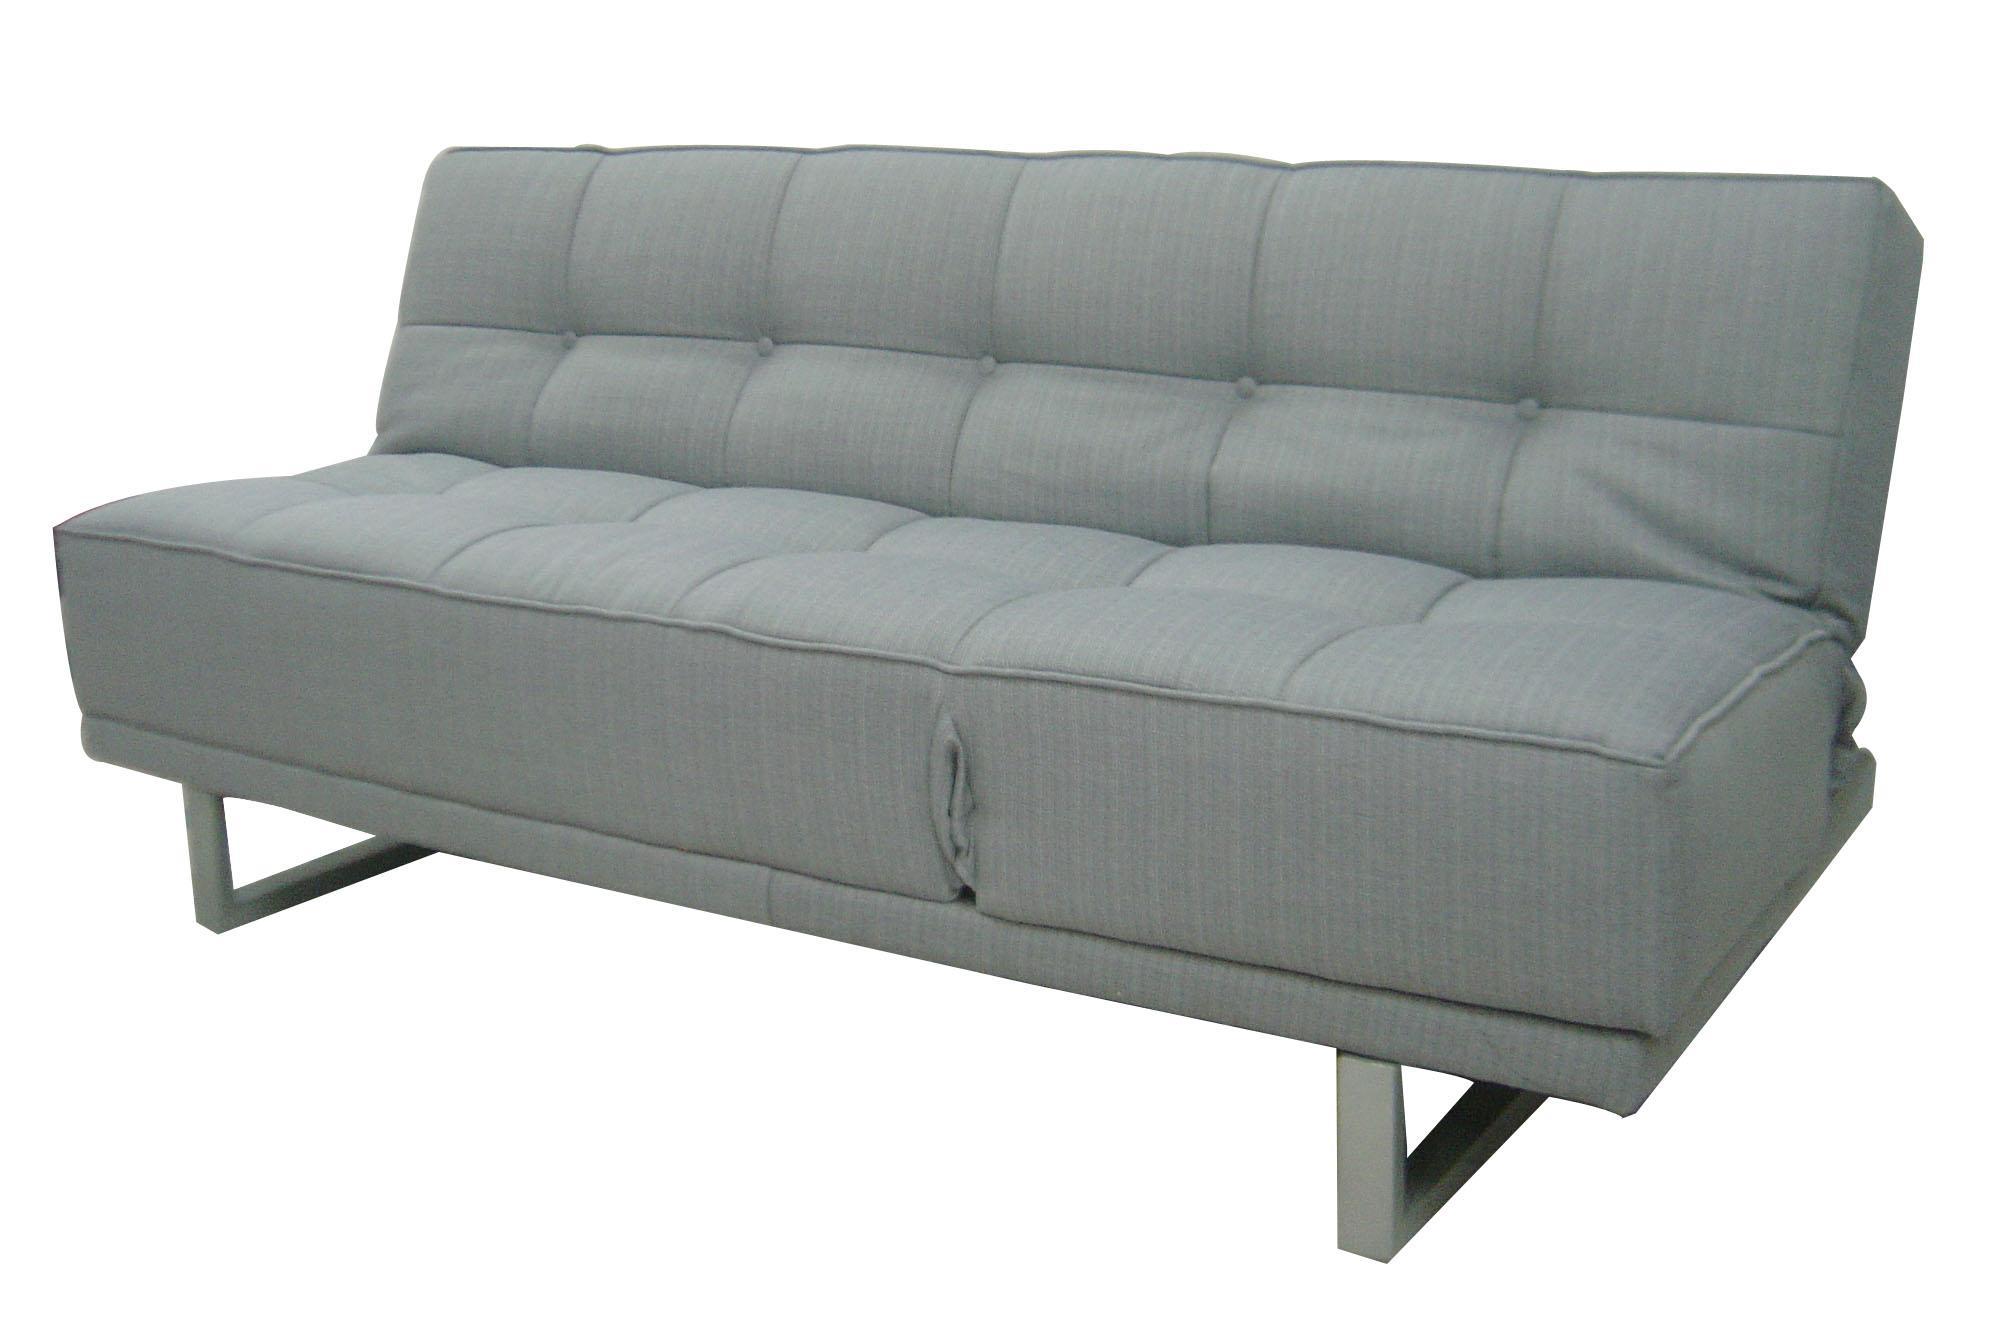 Furniture Bedroom Furniture Foam Sleep Sofa Memory Foam